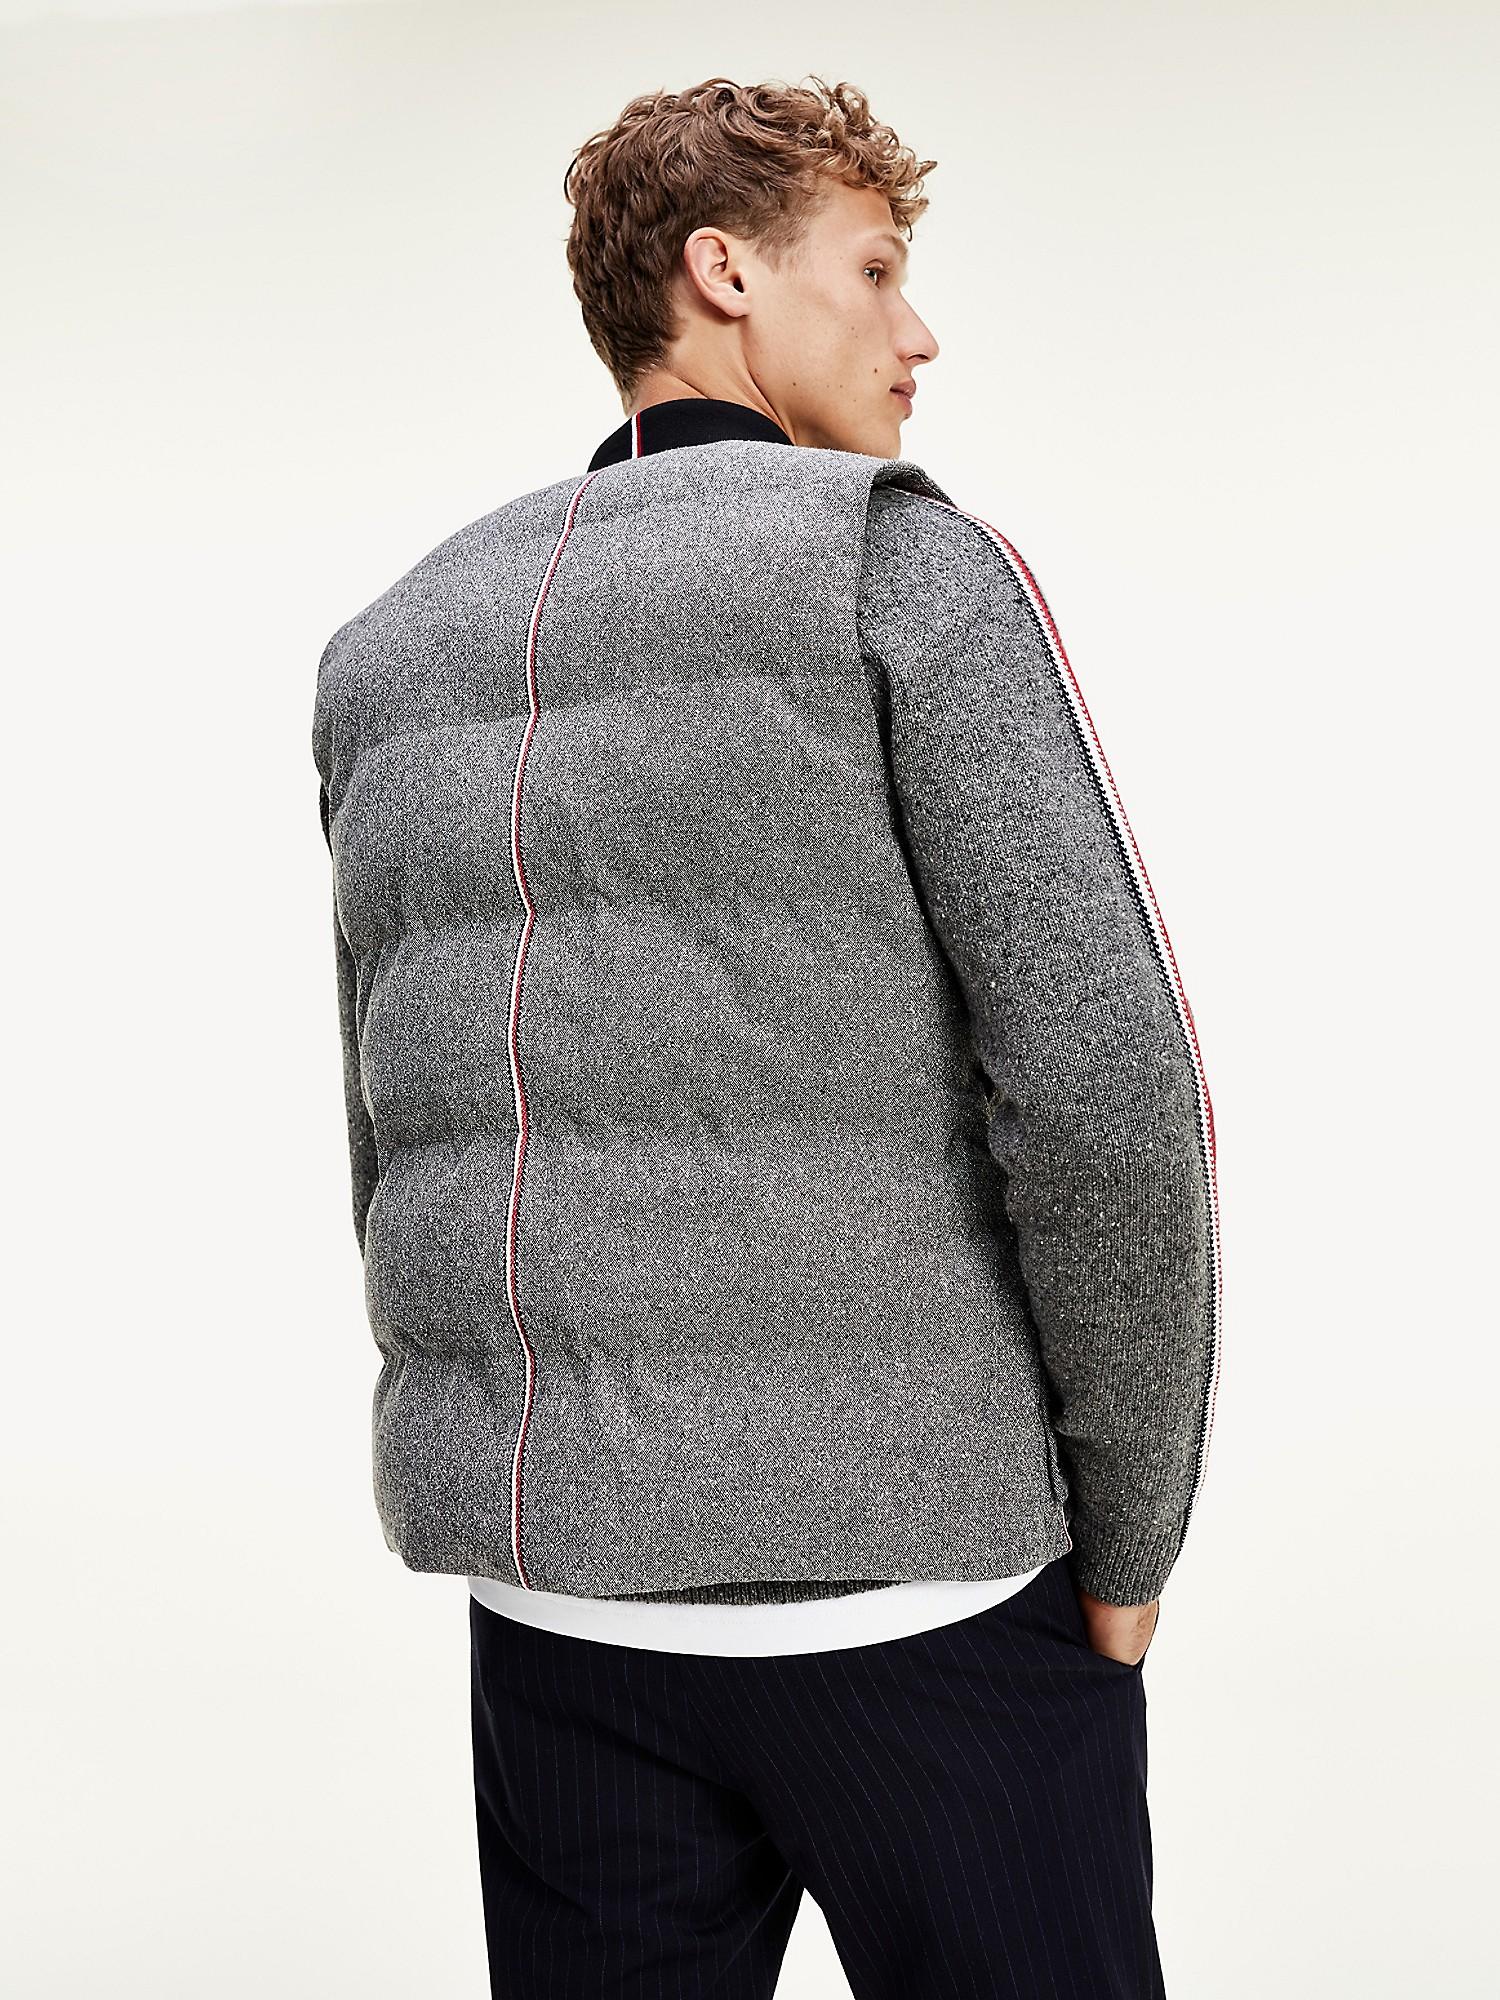 Icon Channeled Vest BLACK/GREY